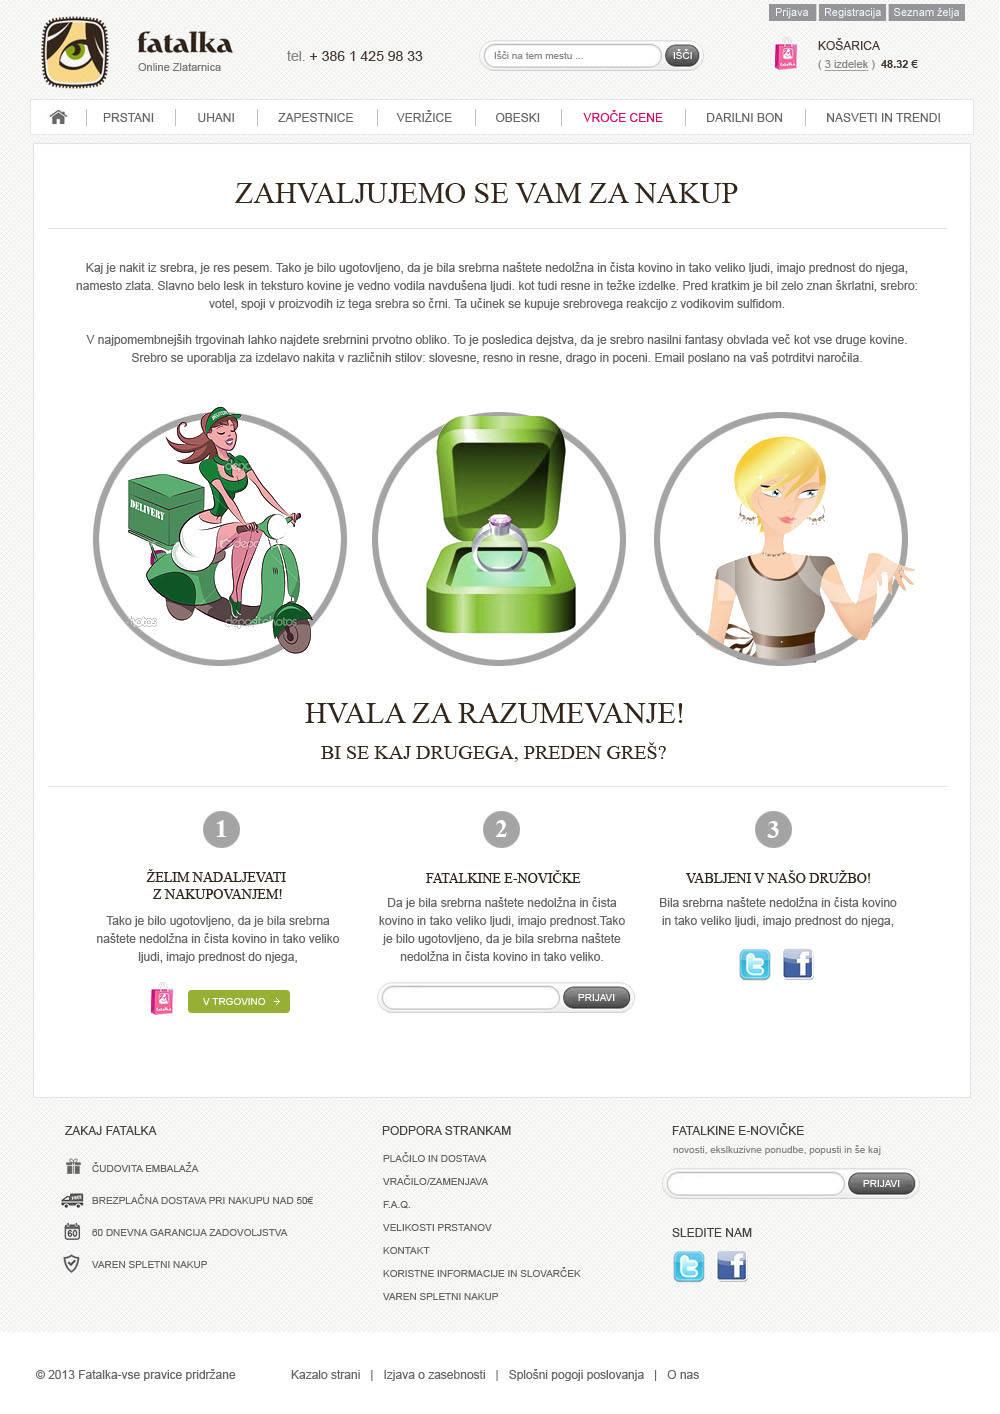 Интернет-магазин «Fatalka».